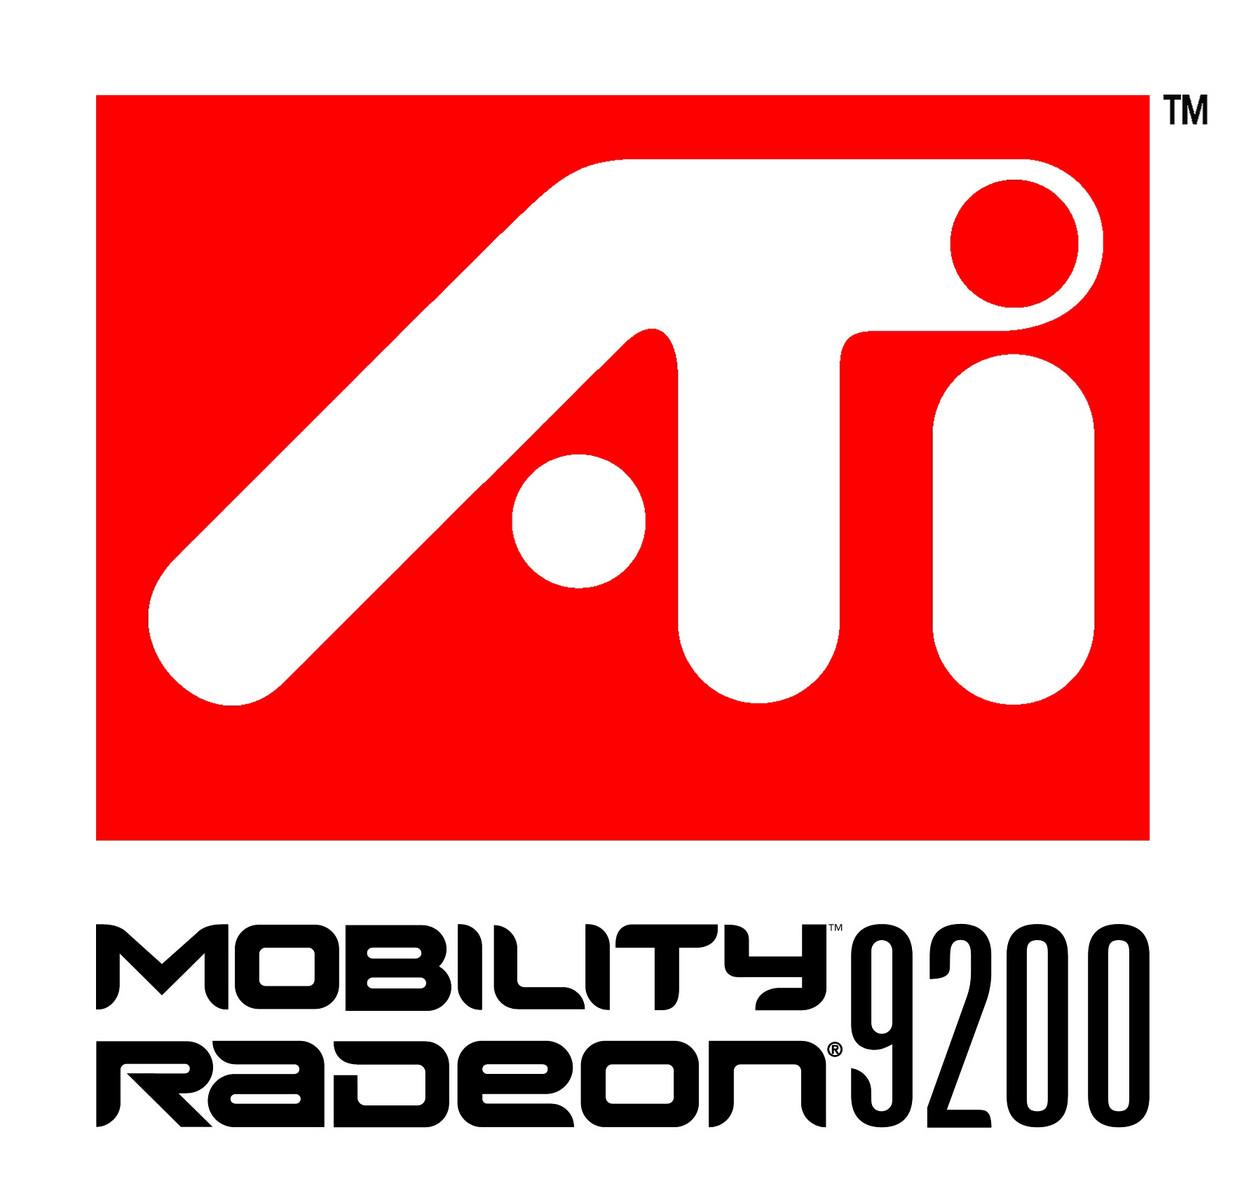 ati mobility radeon 9200 tech. Black Bedroom Furniture Sets. Home Design Ideas